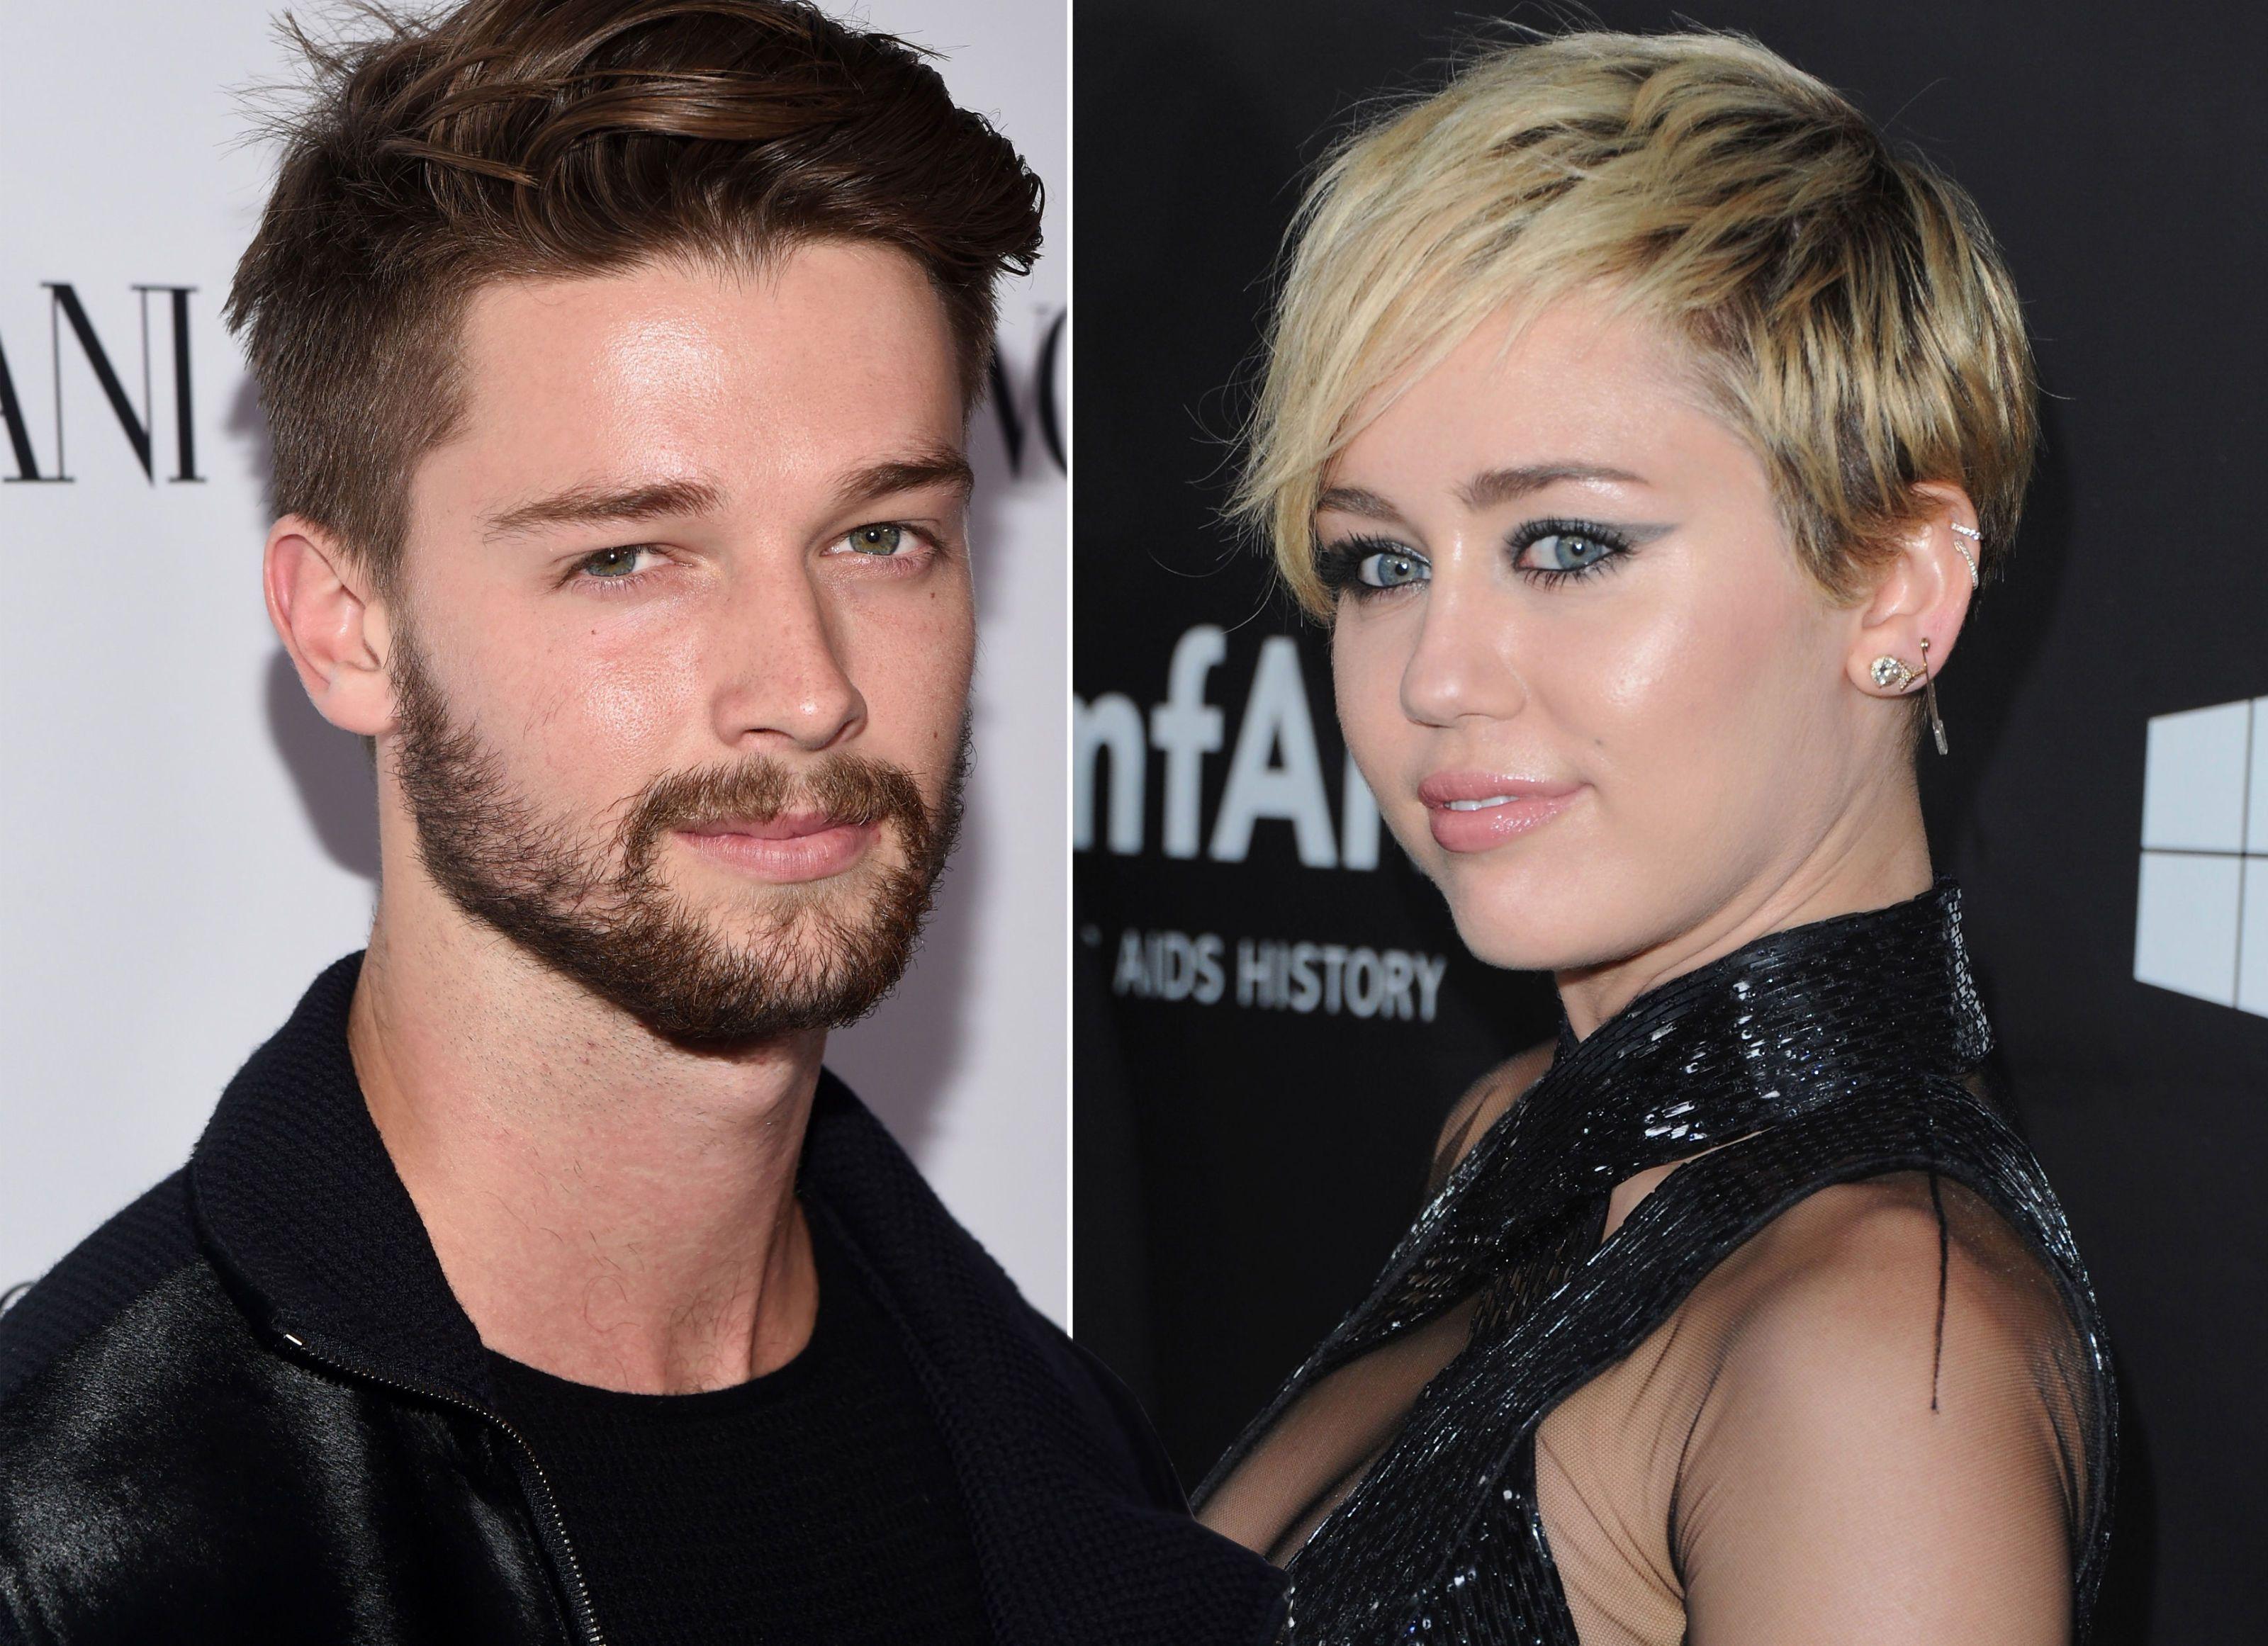 Miley cyrus dating arnold schwarzenegger son